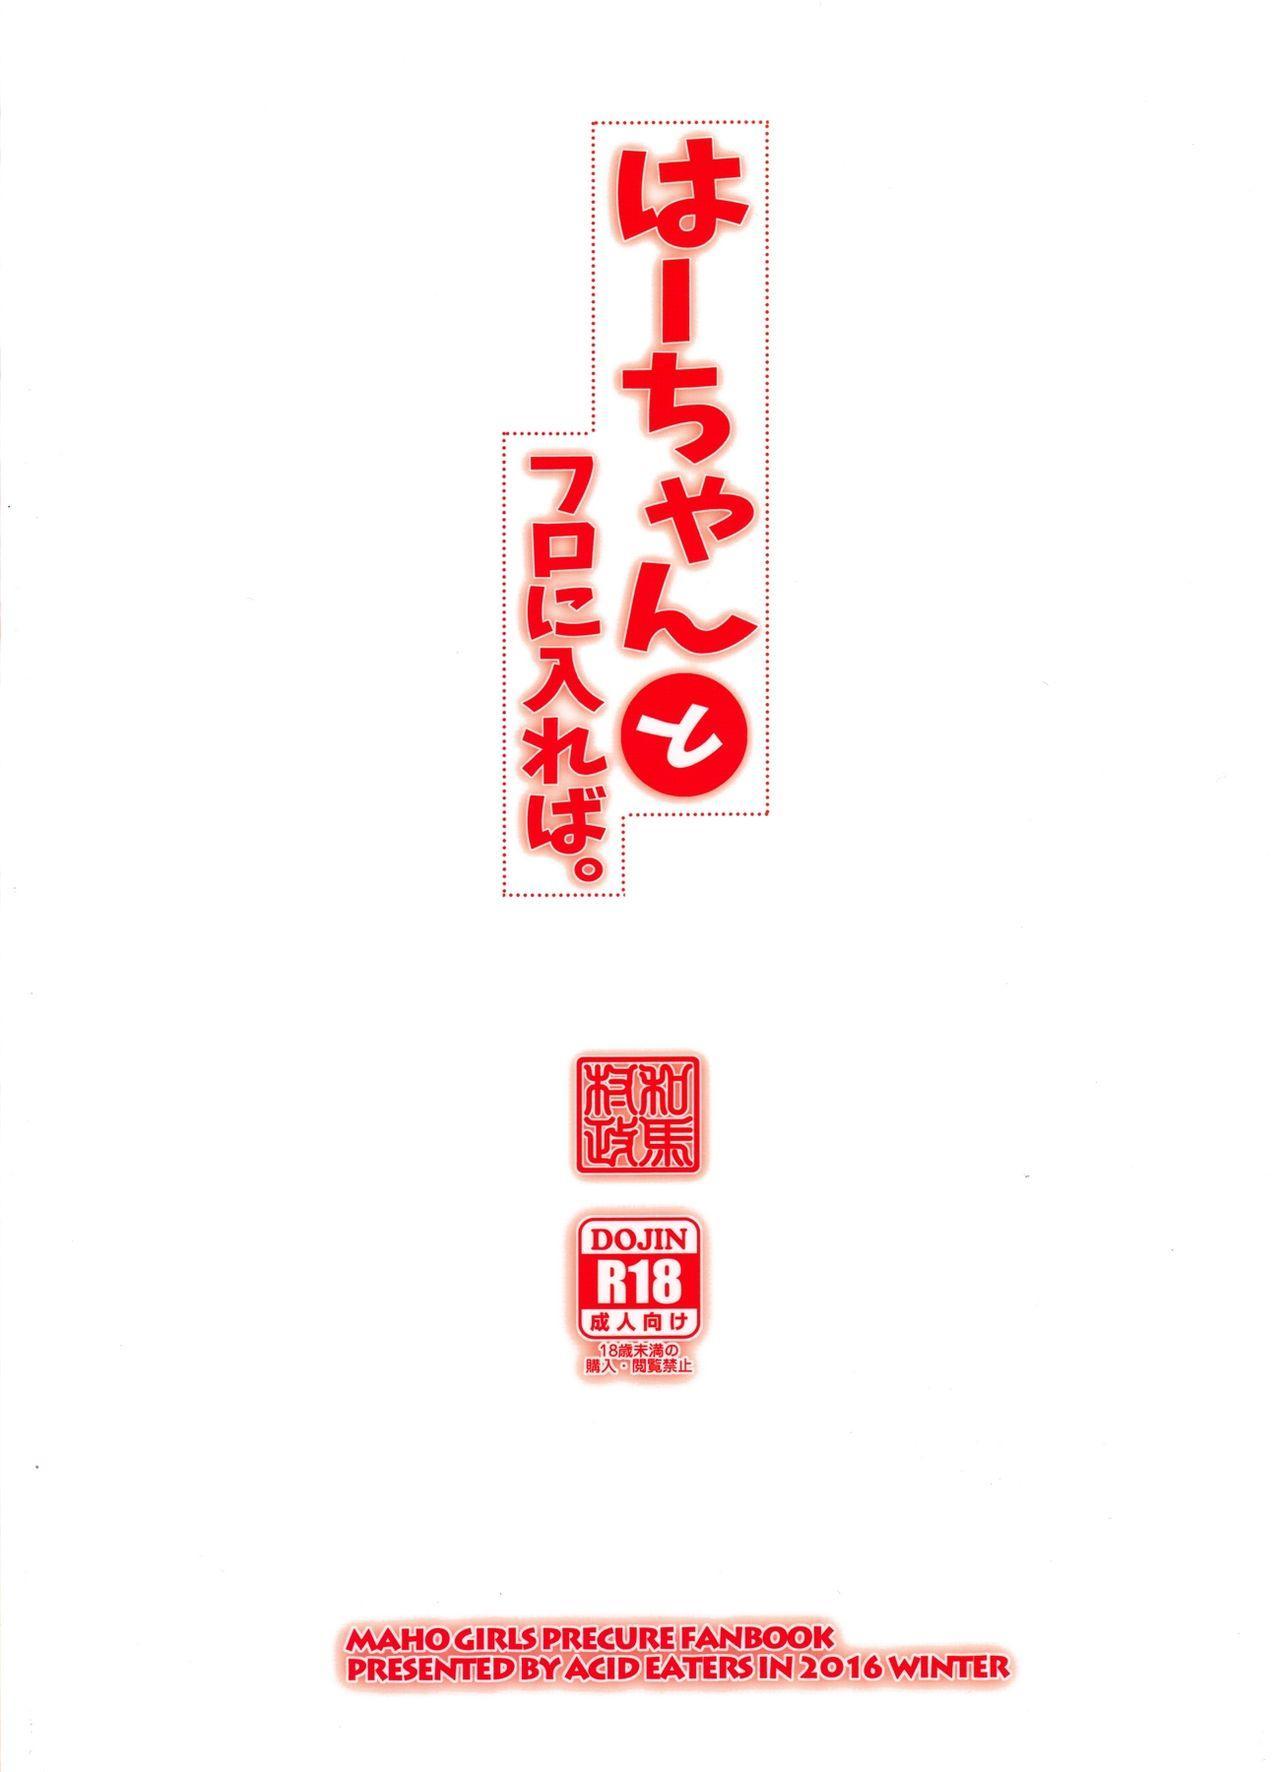 (C91) [ACID EATERS (Kazuma Muramasa)] Haa-chan to Furo ni Haireba. (Mahou Tsukai Precure!)(Chinese) 26